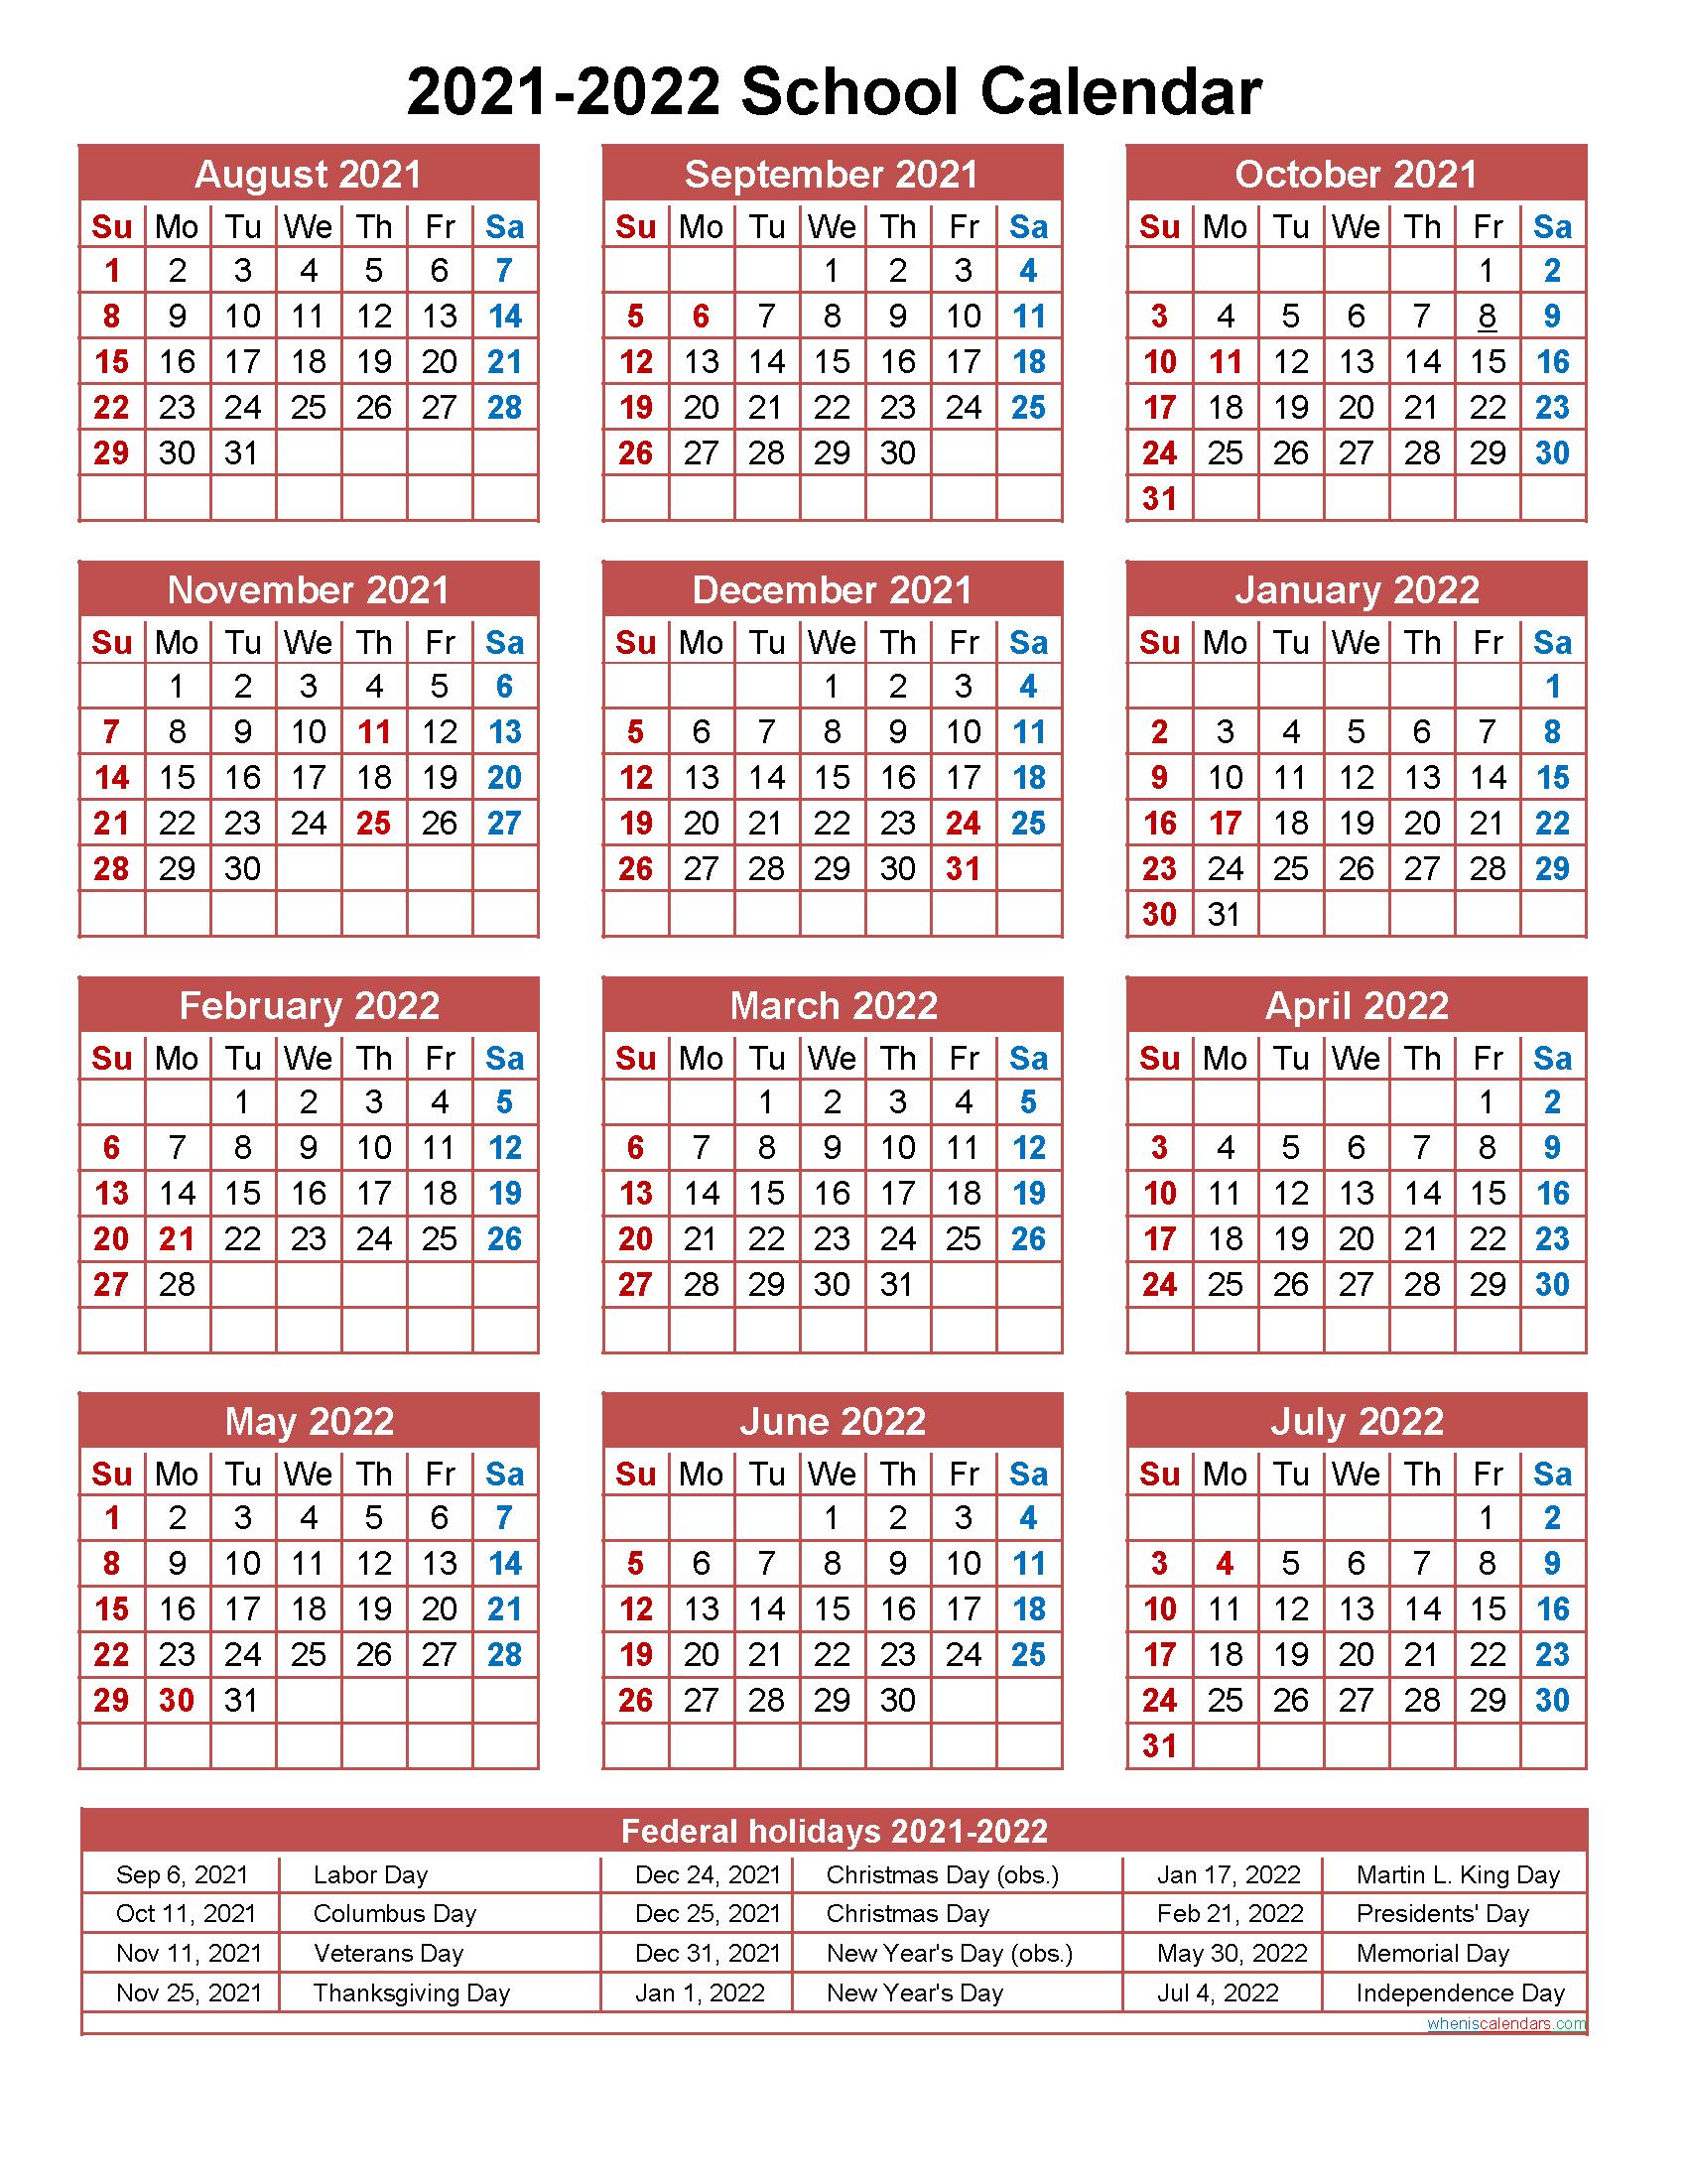 Printable School Calendar 2021 22 - Calendar 2021